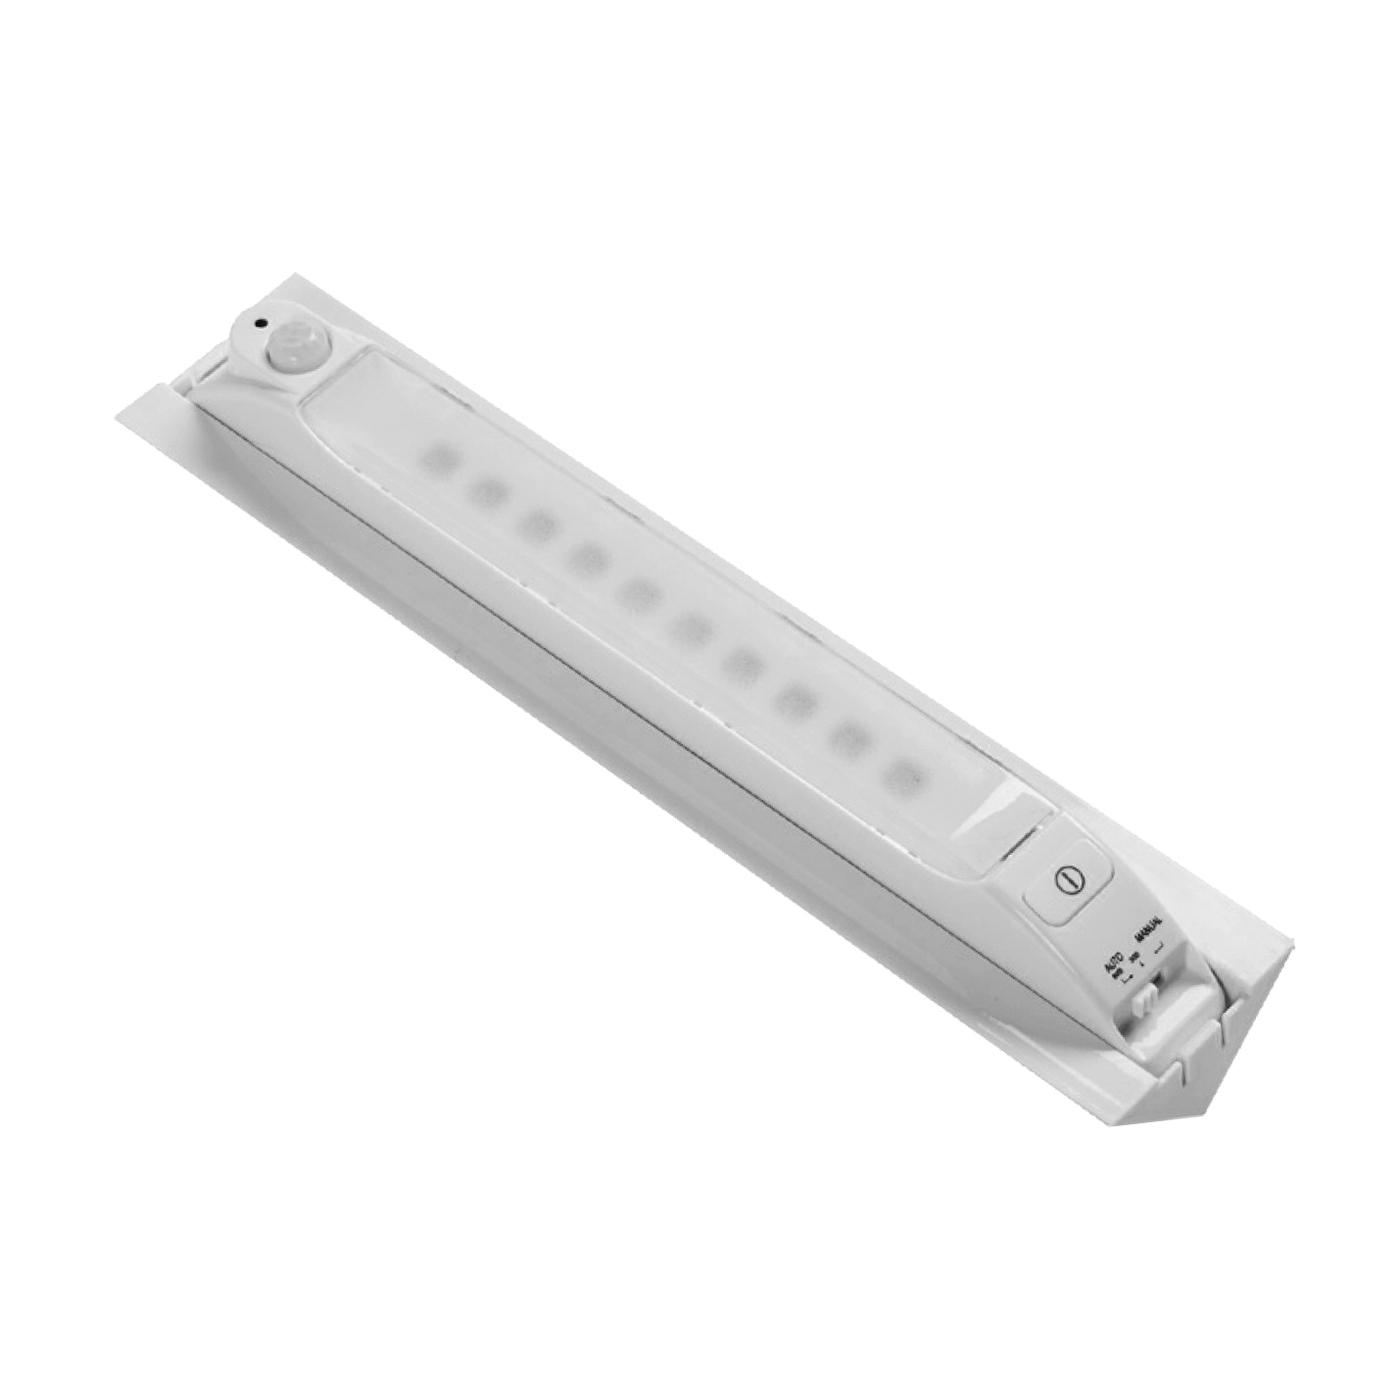 Picture of Fulcrum 30050-308 Motion Sensor Light, AA Battery, 10-Lamp, LED Lamp, 65 Lumens, 7000 K Color Temp, White